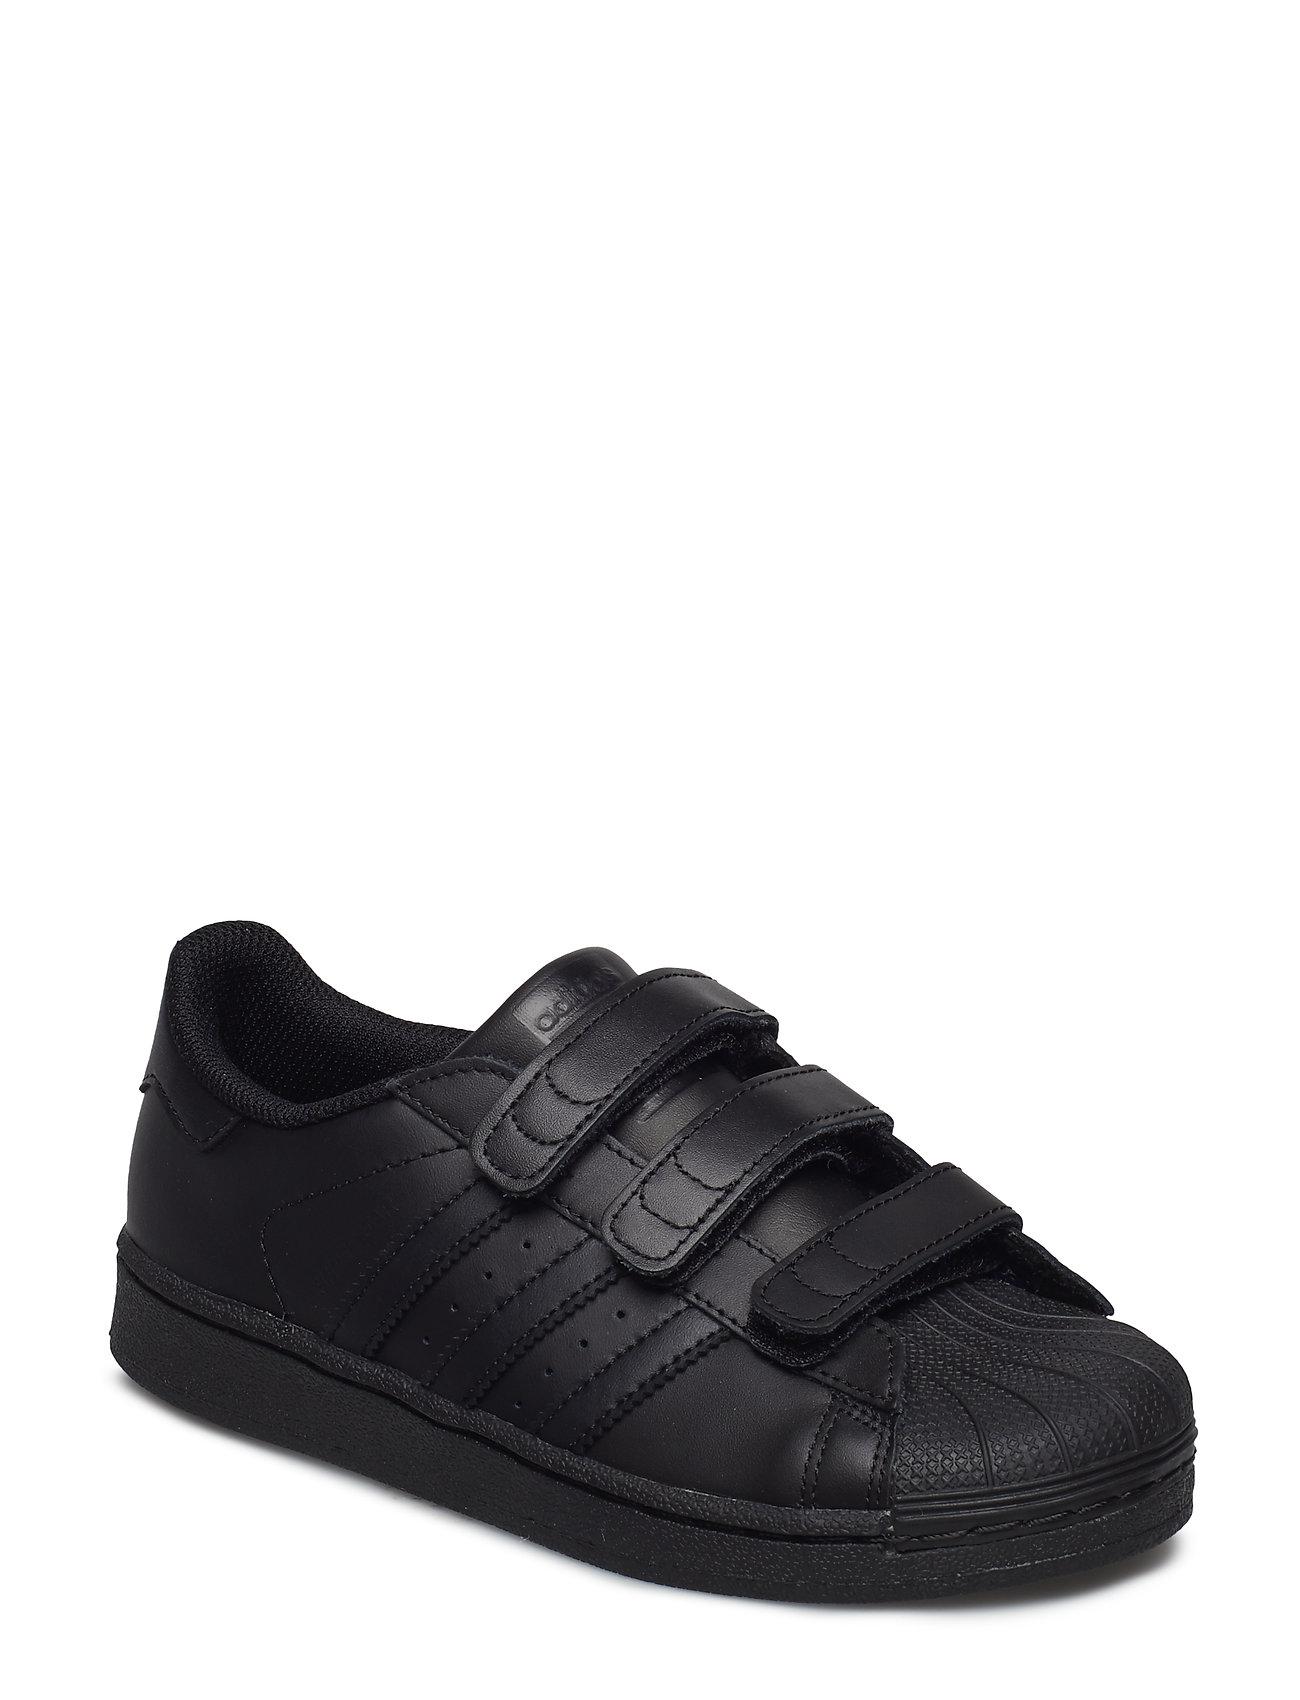 adidas Originals Superstar CF C - CBLACK/CBLACK/CBLACK